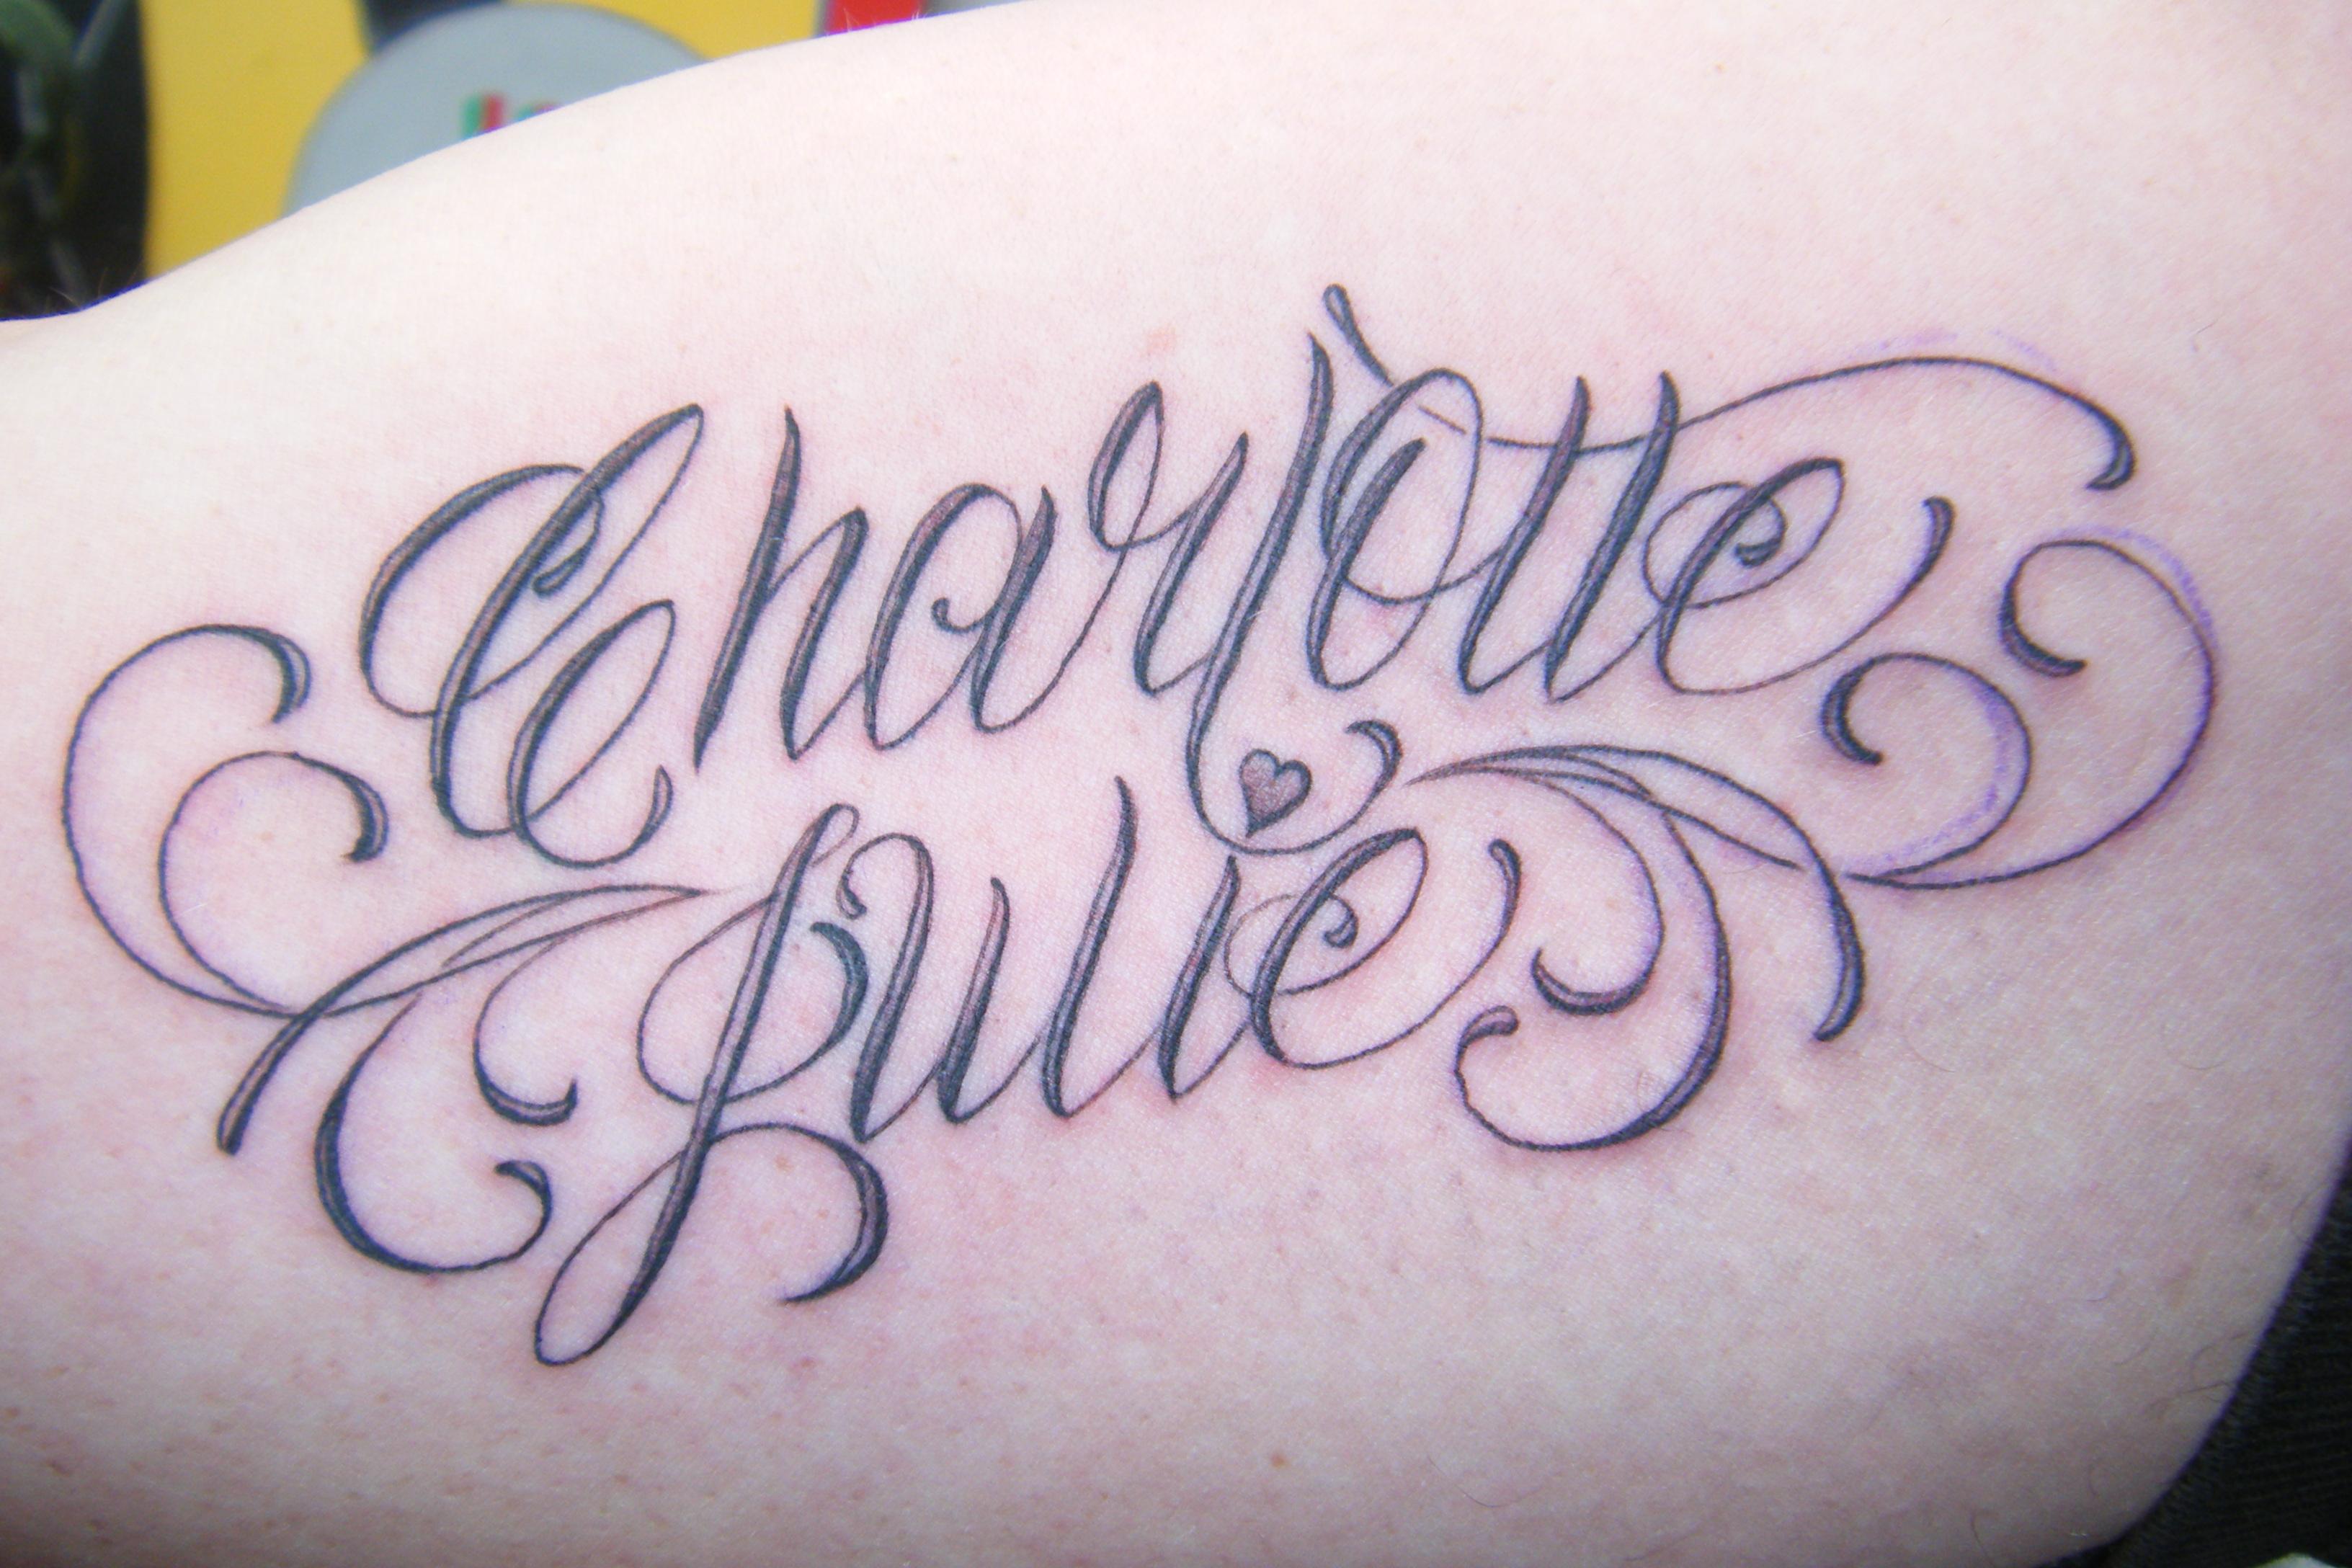 Danny Boy Sawyer, Daniel Sawyer, Rose Tattoo Amsterdam, Traditional tattoo, americana tattoo, anchor tattoo, amsterdam tattoo shop, classic tattoo, traditional, lettering, black and grey tattoo